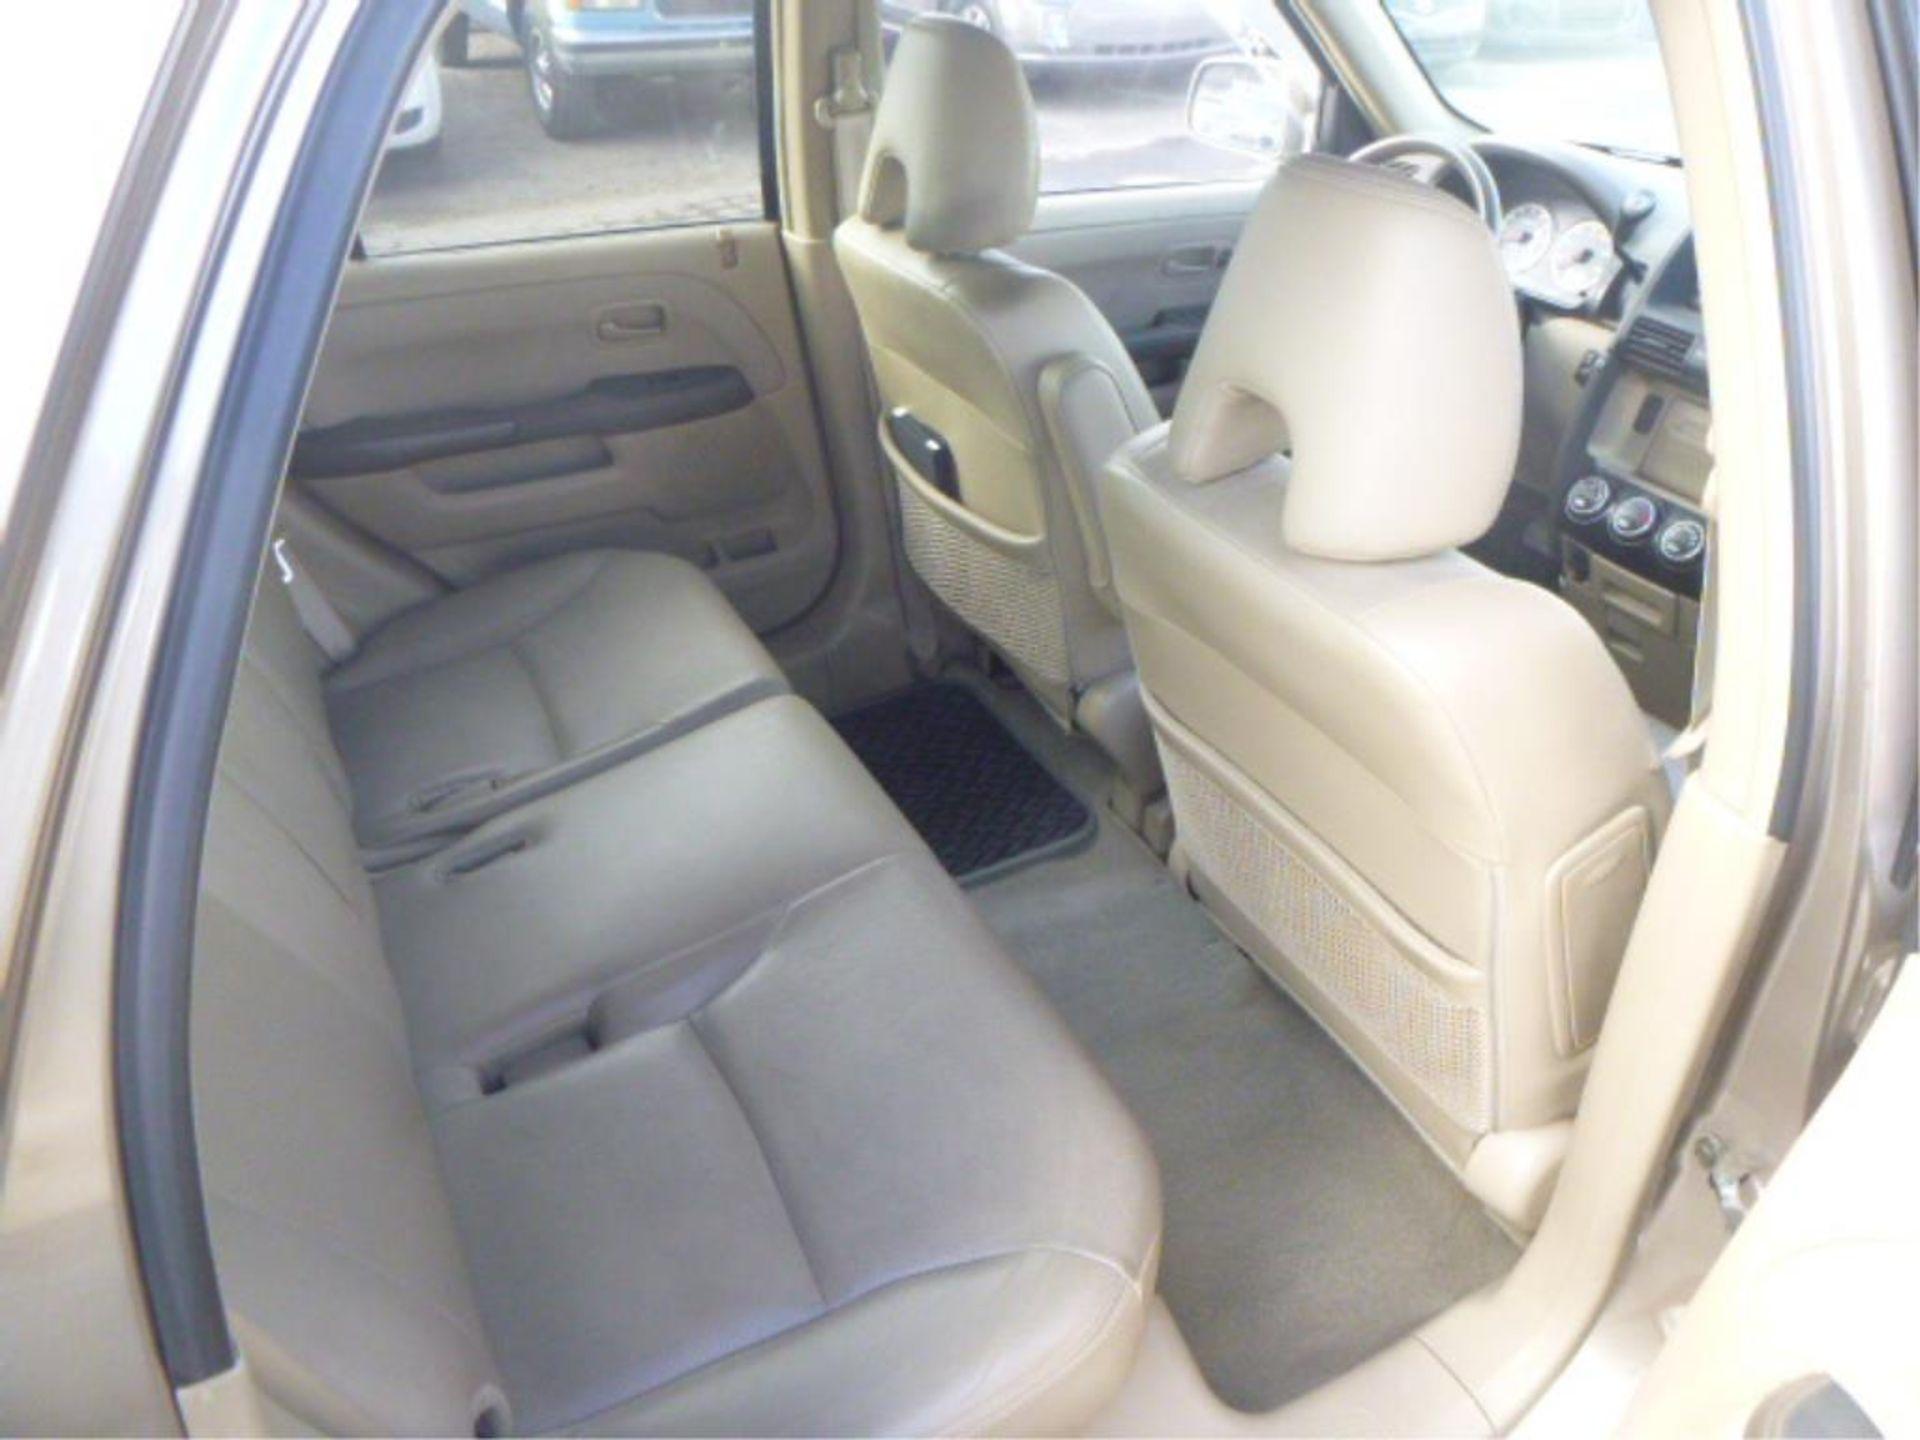 2005 Honda CR-V - Image 9 of 14